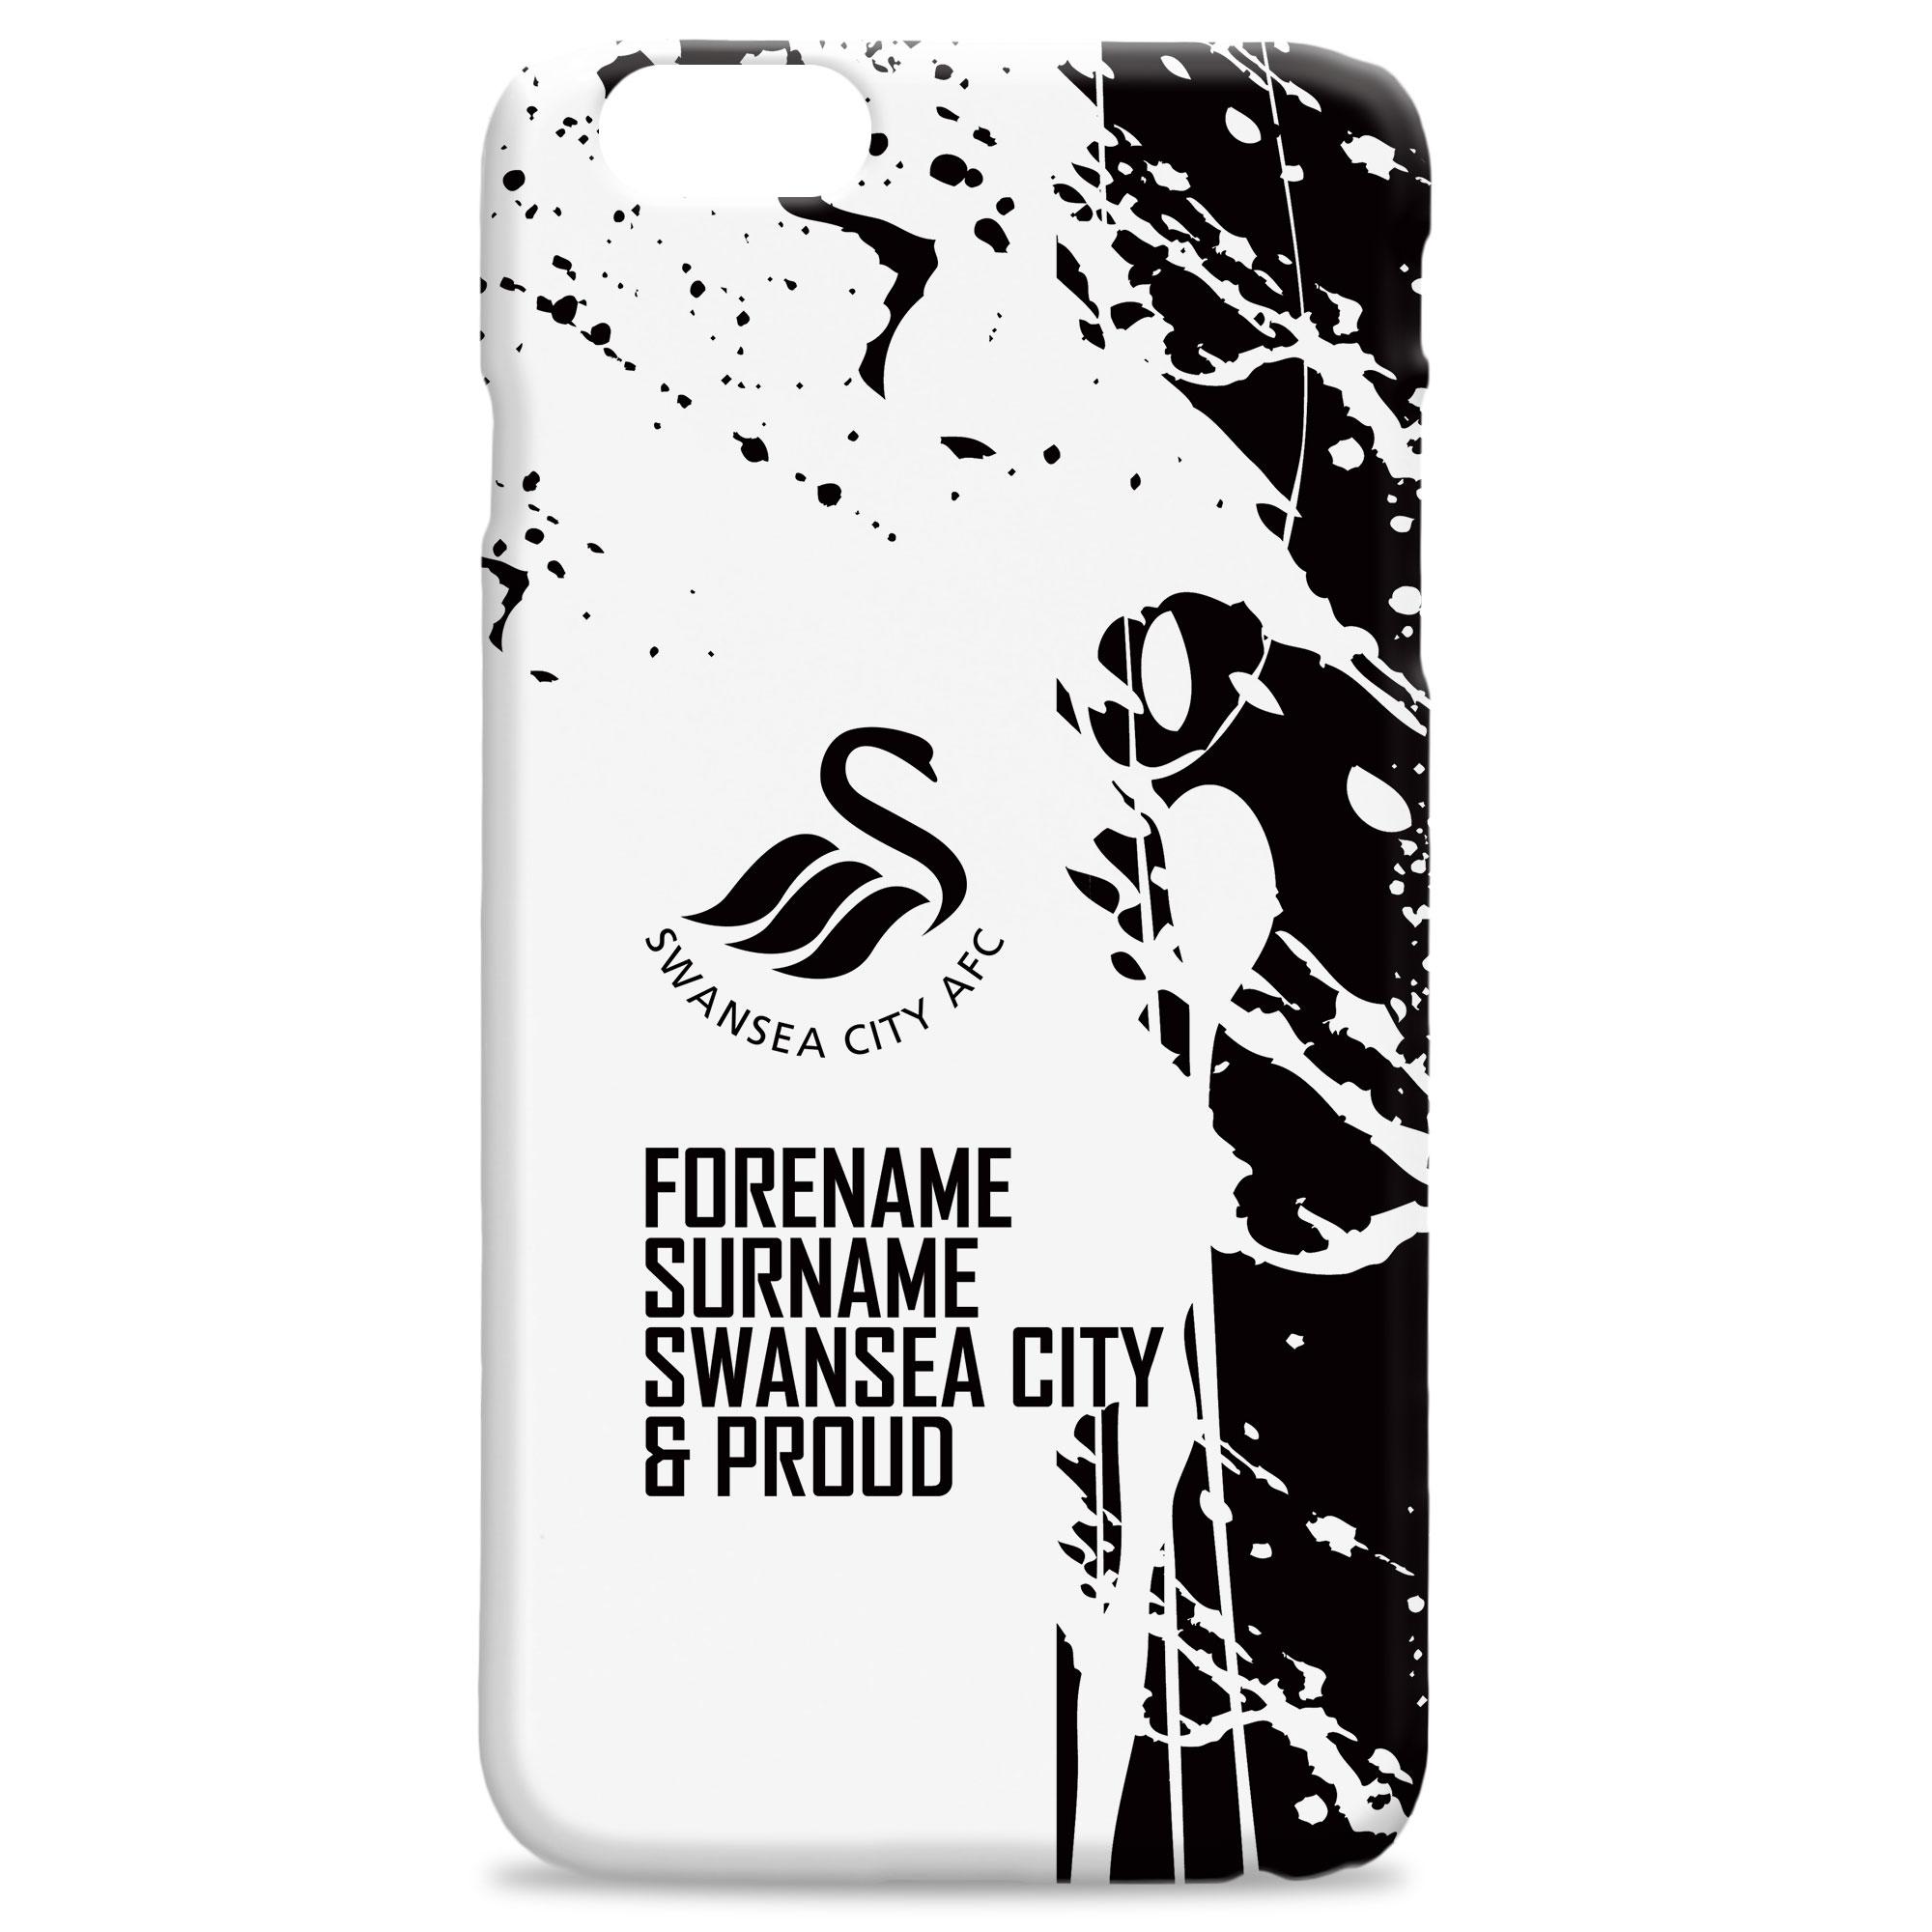 Swansea City AFC Proud Hard Back Phone Case